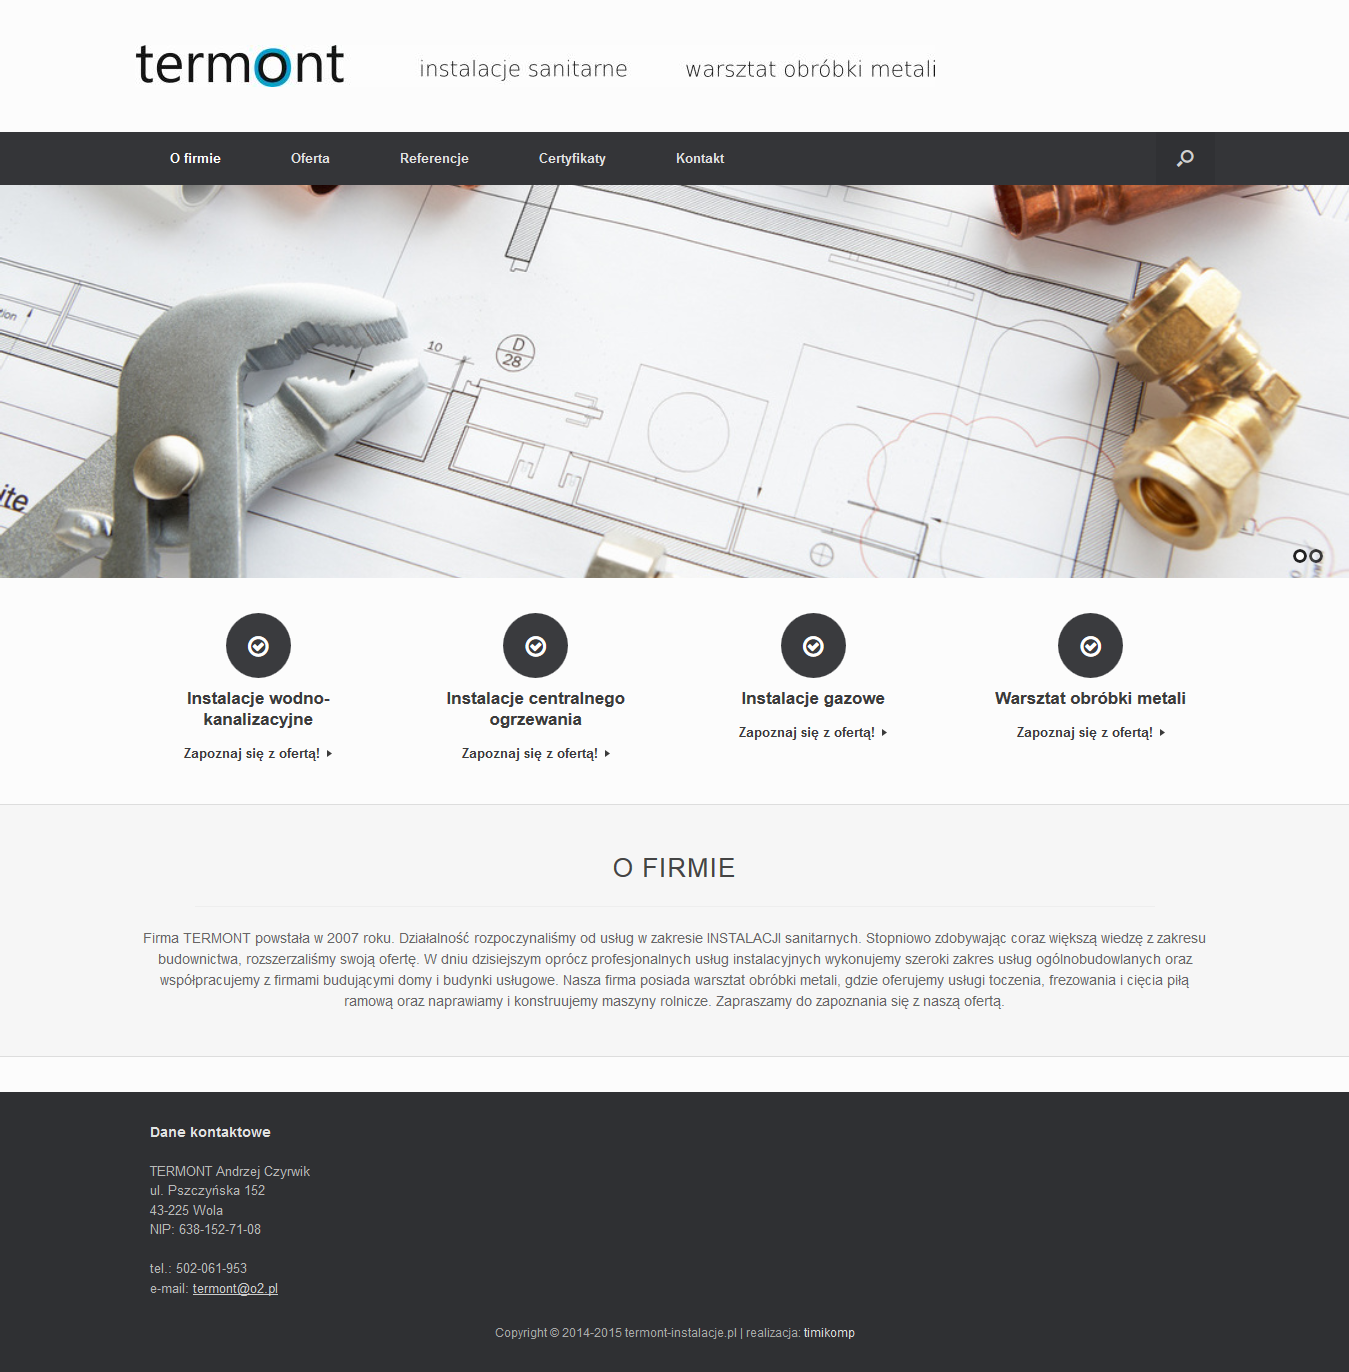 Termont Wola